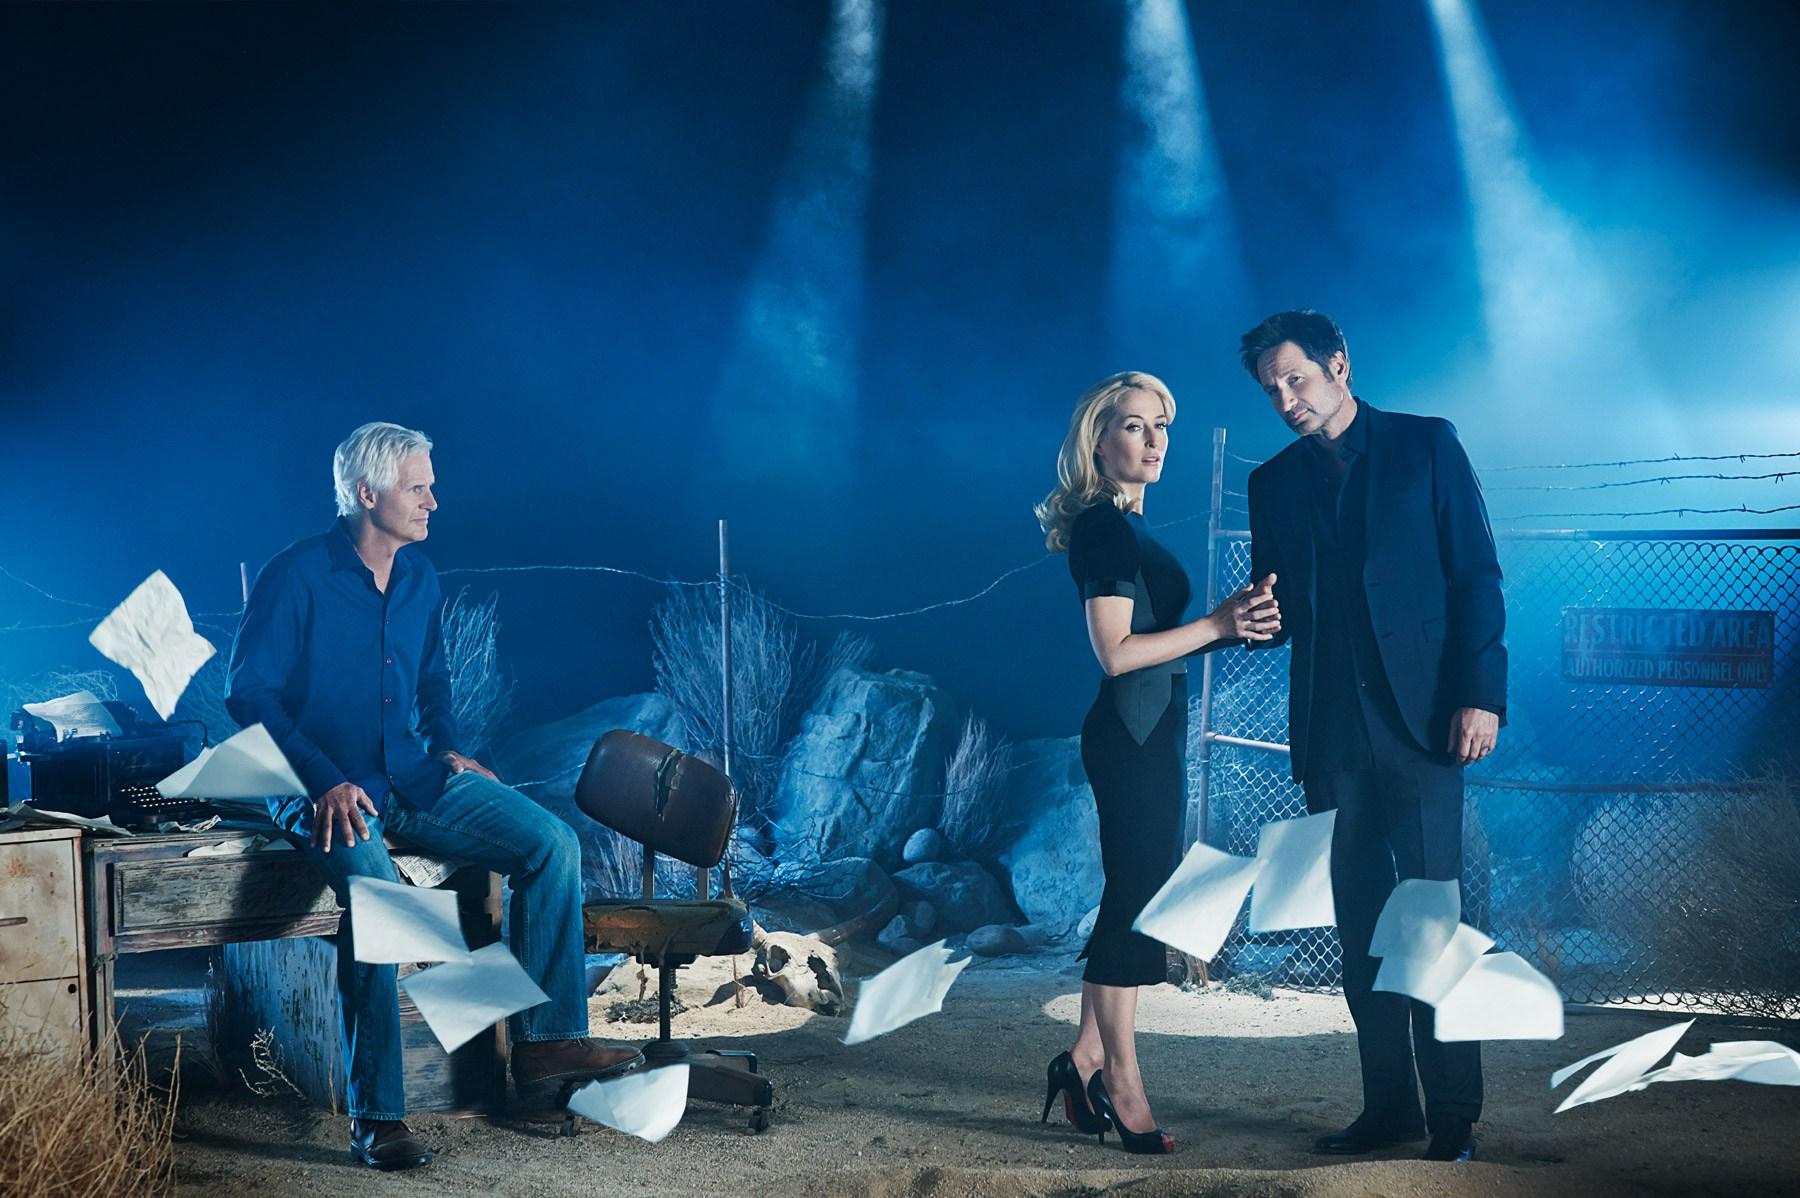 El director de The X-Files revela algunas verdades sobre el final de la serie